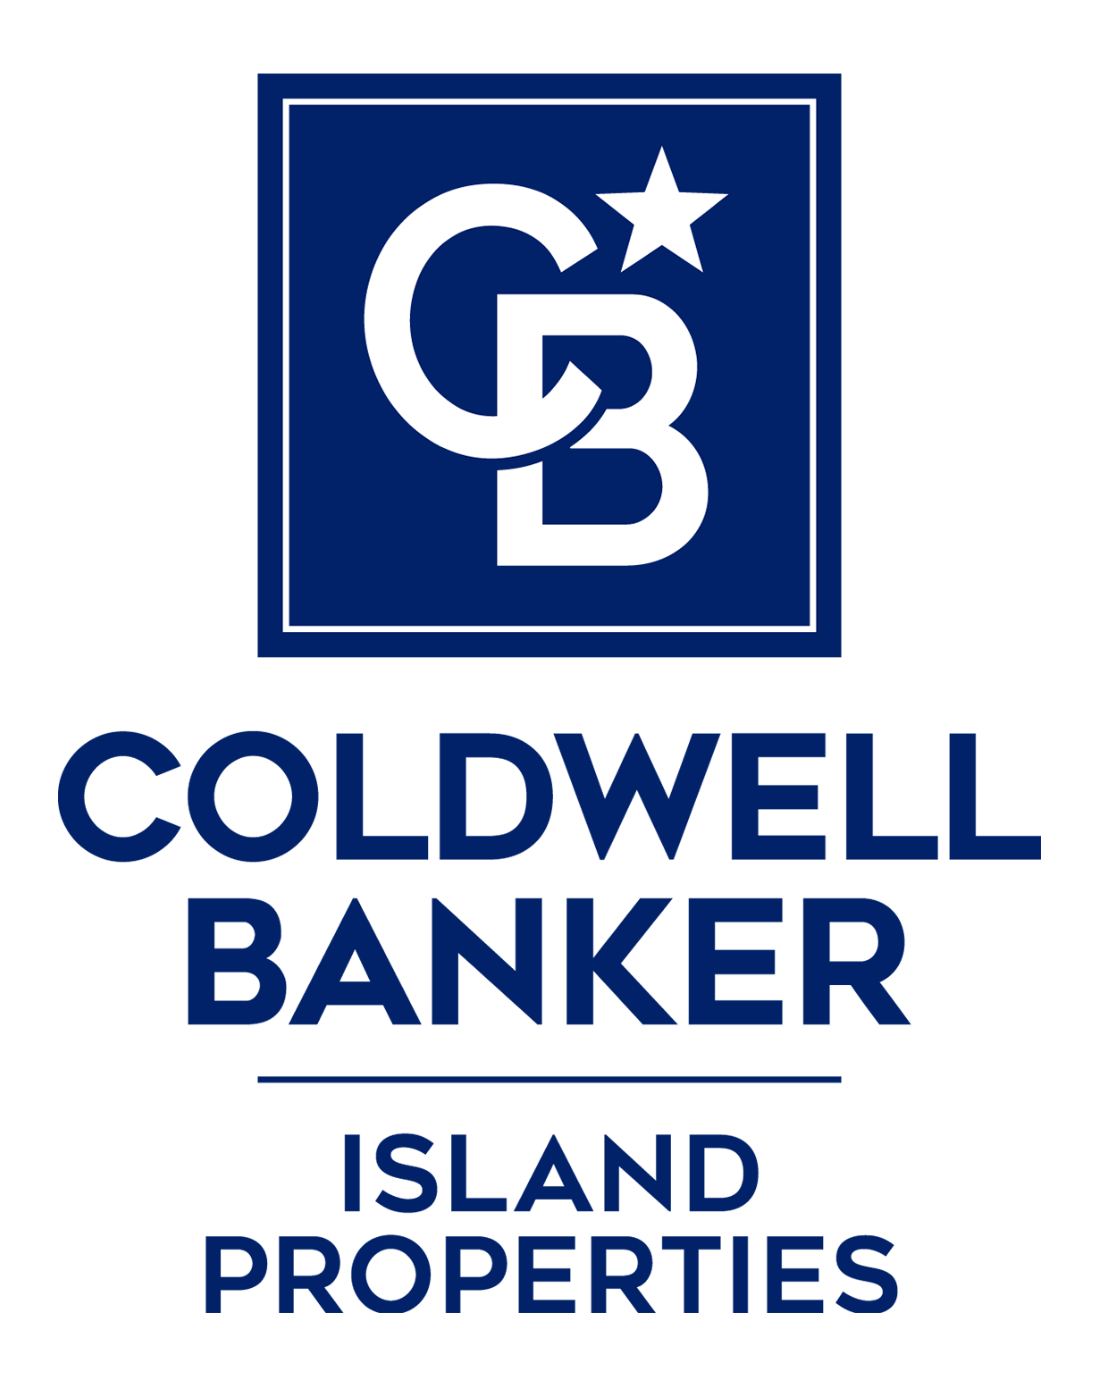 Bruce Edward McDonald - Coldwell Banker Island Properties